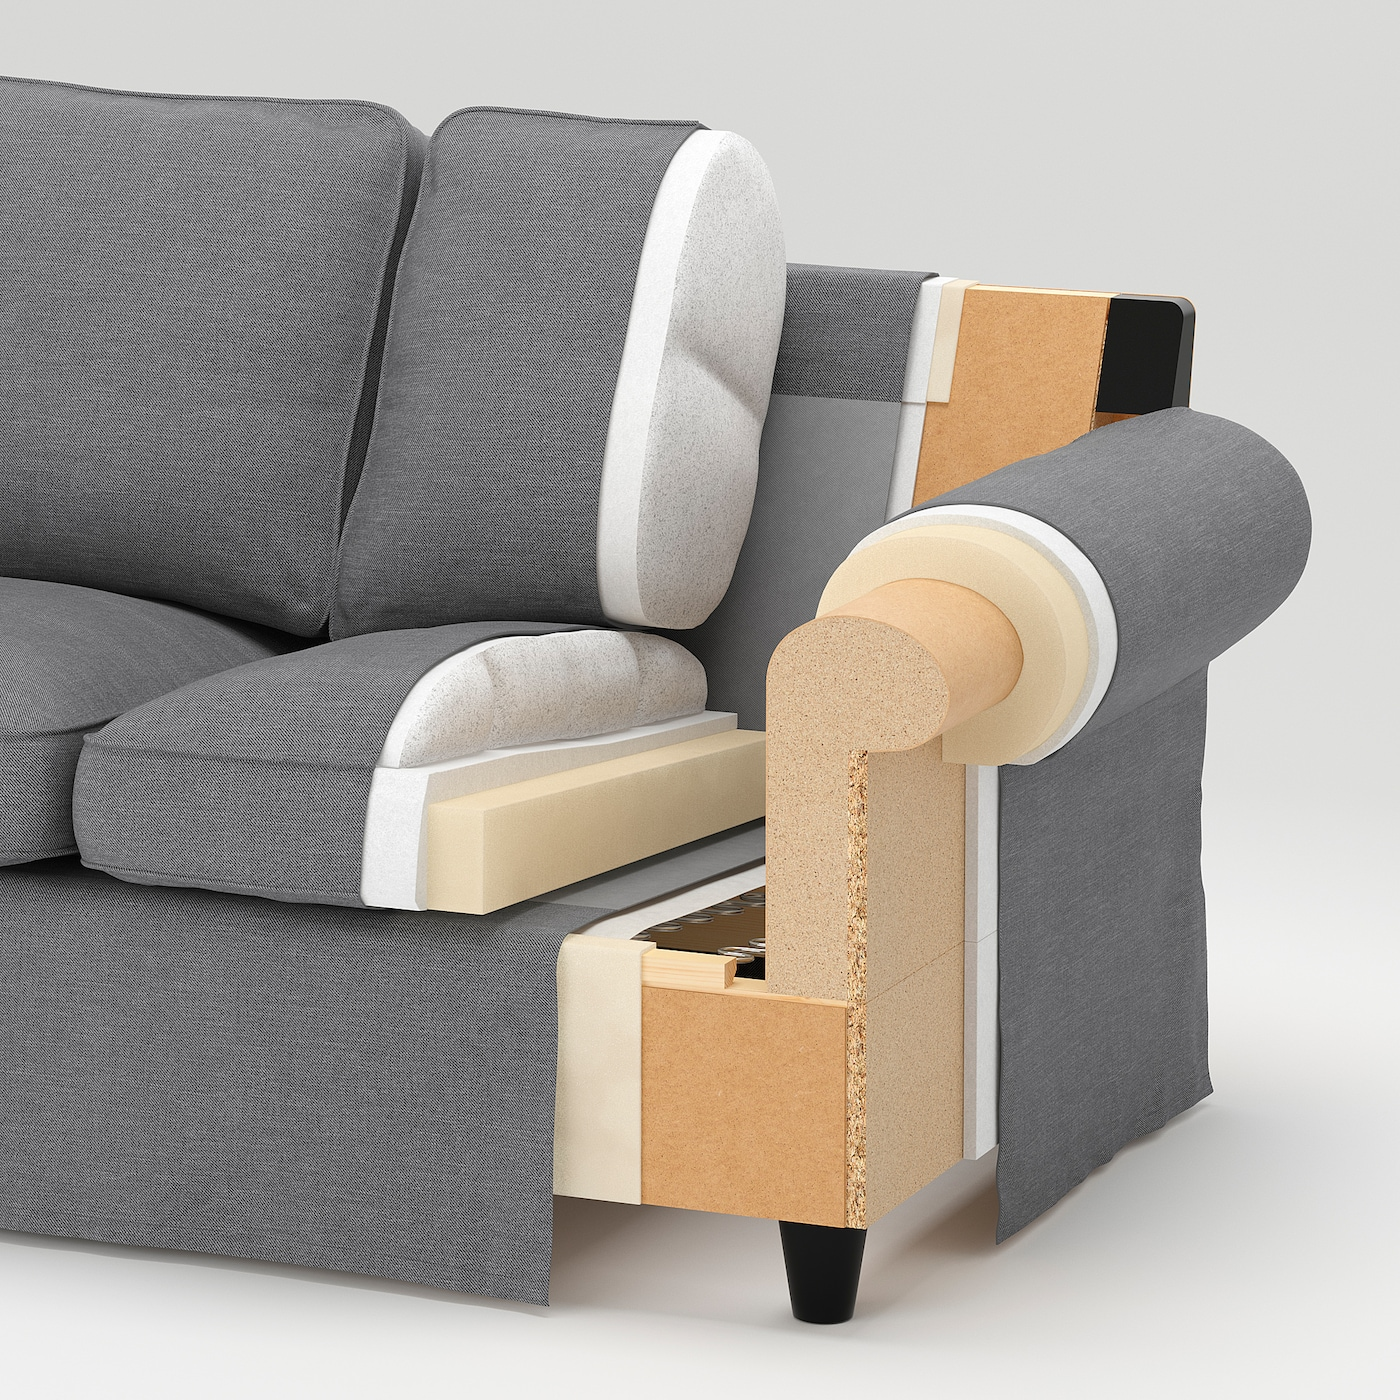 Ektorp 2 5 Zits Slaapbank.Ektorp 2 Seat Sofa Orrsta Black Blue Ikea